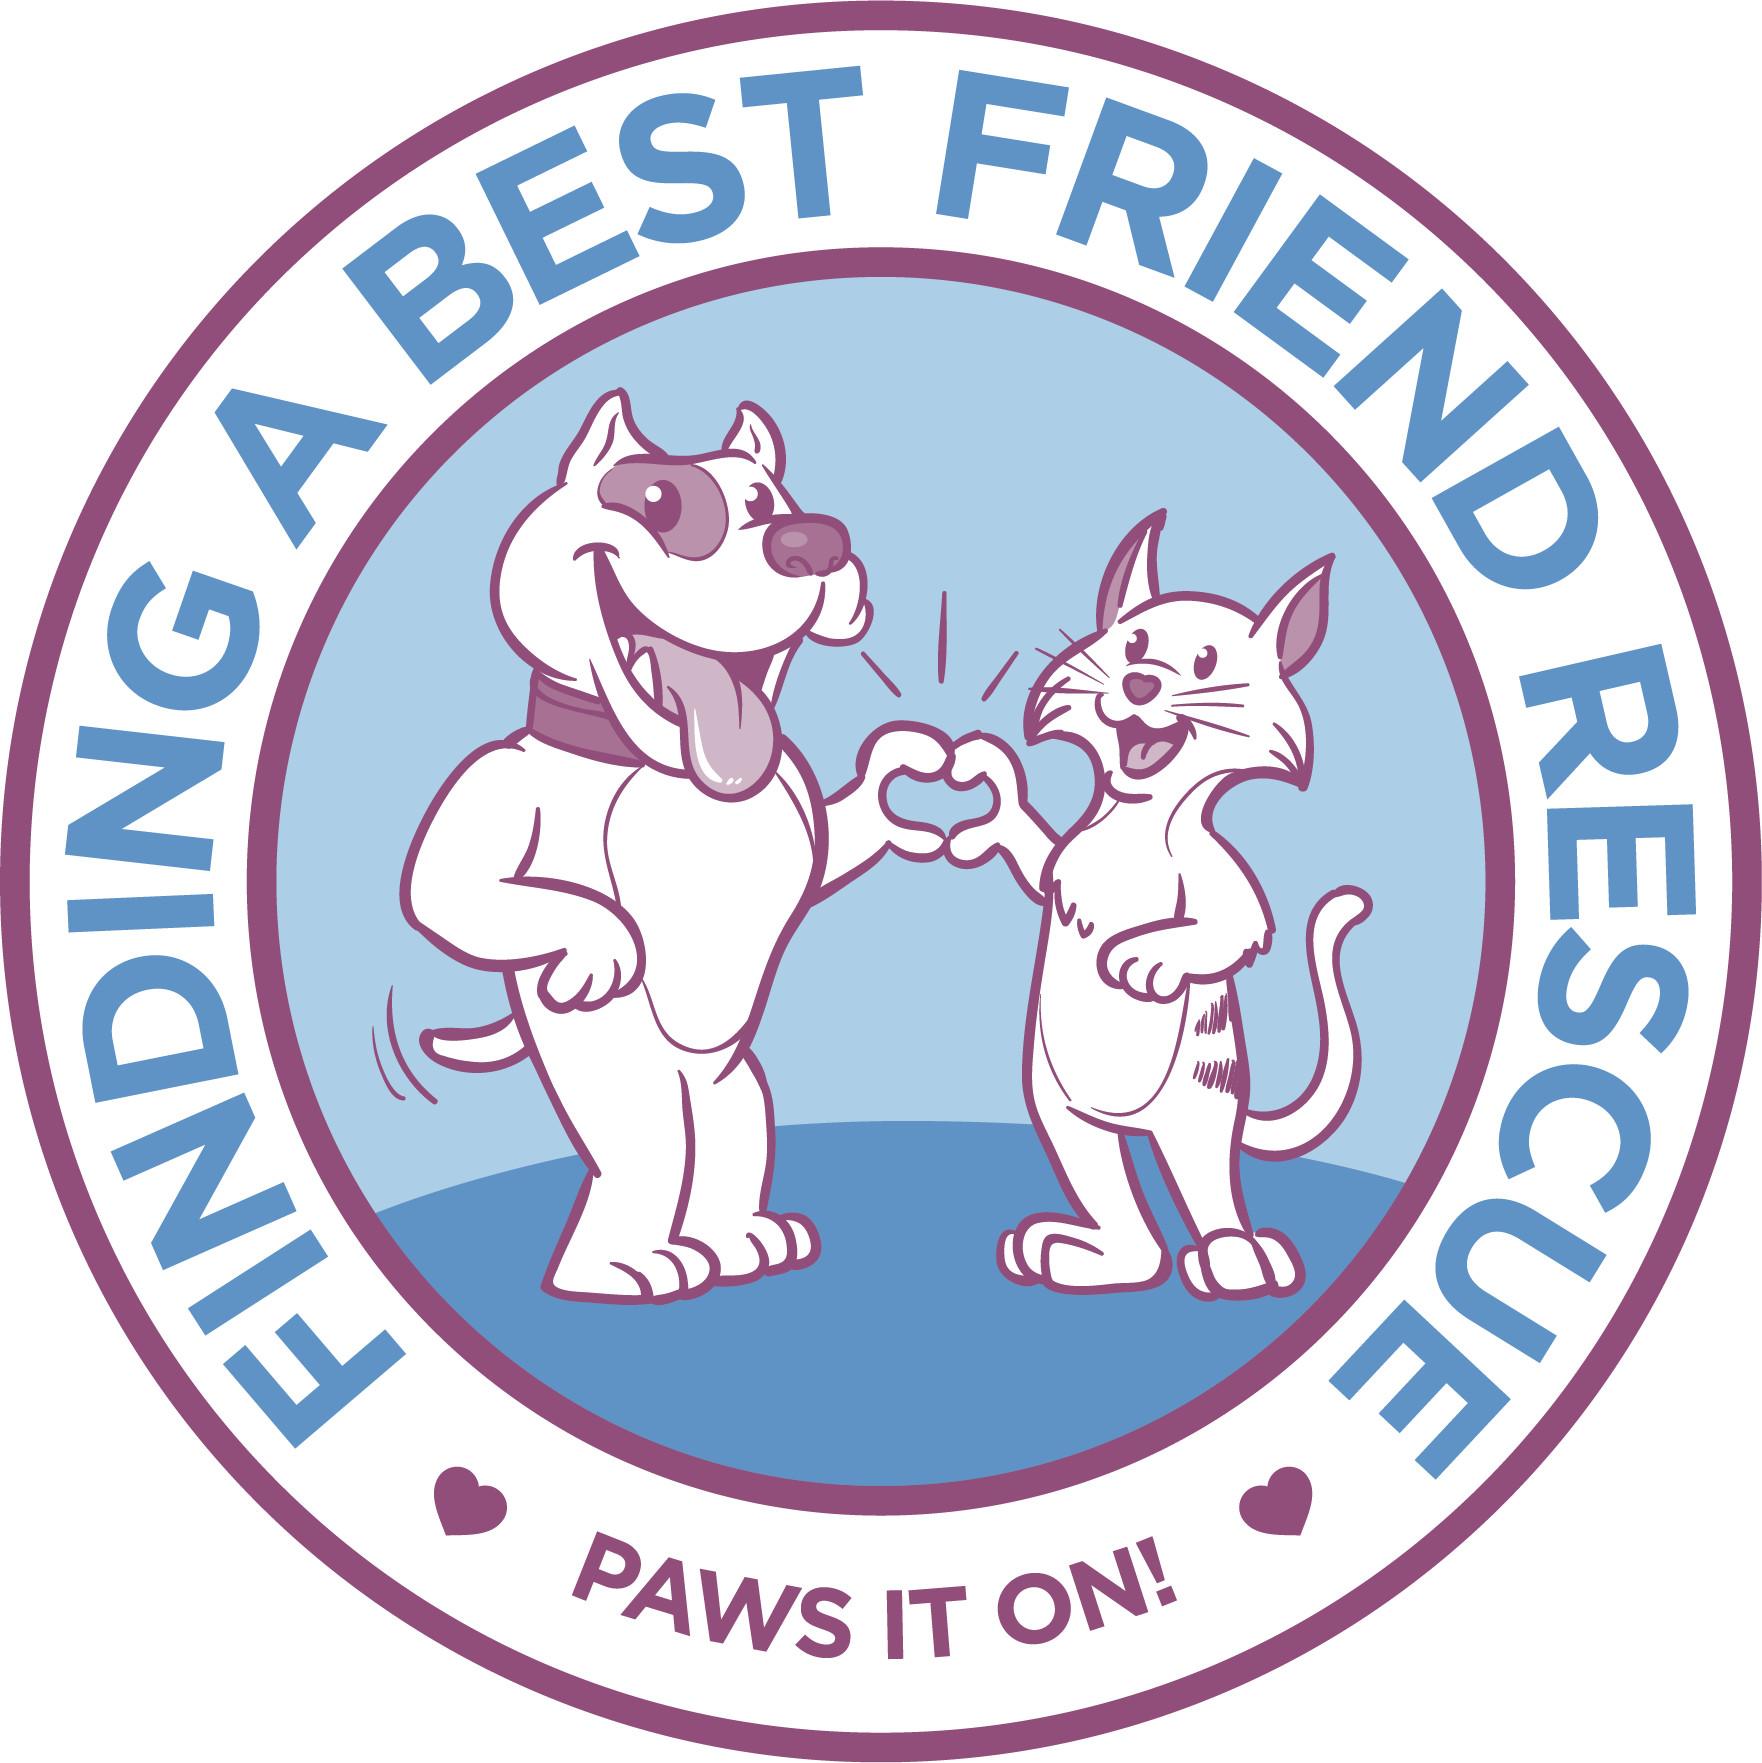 Finding A Best Friend Rescue